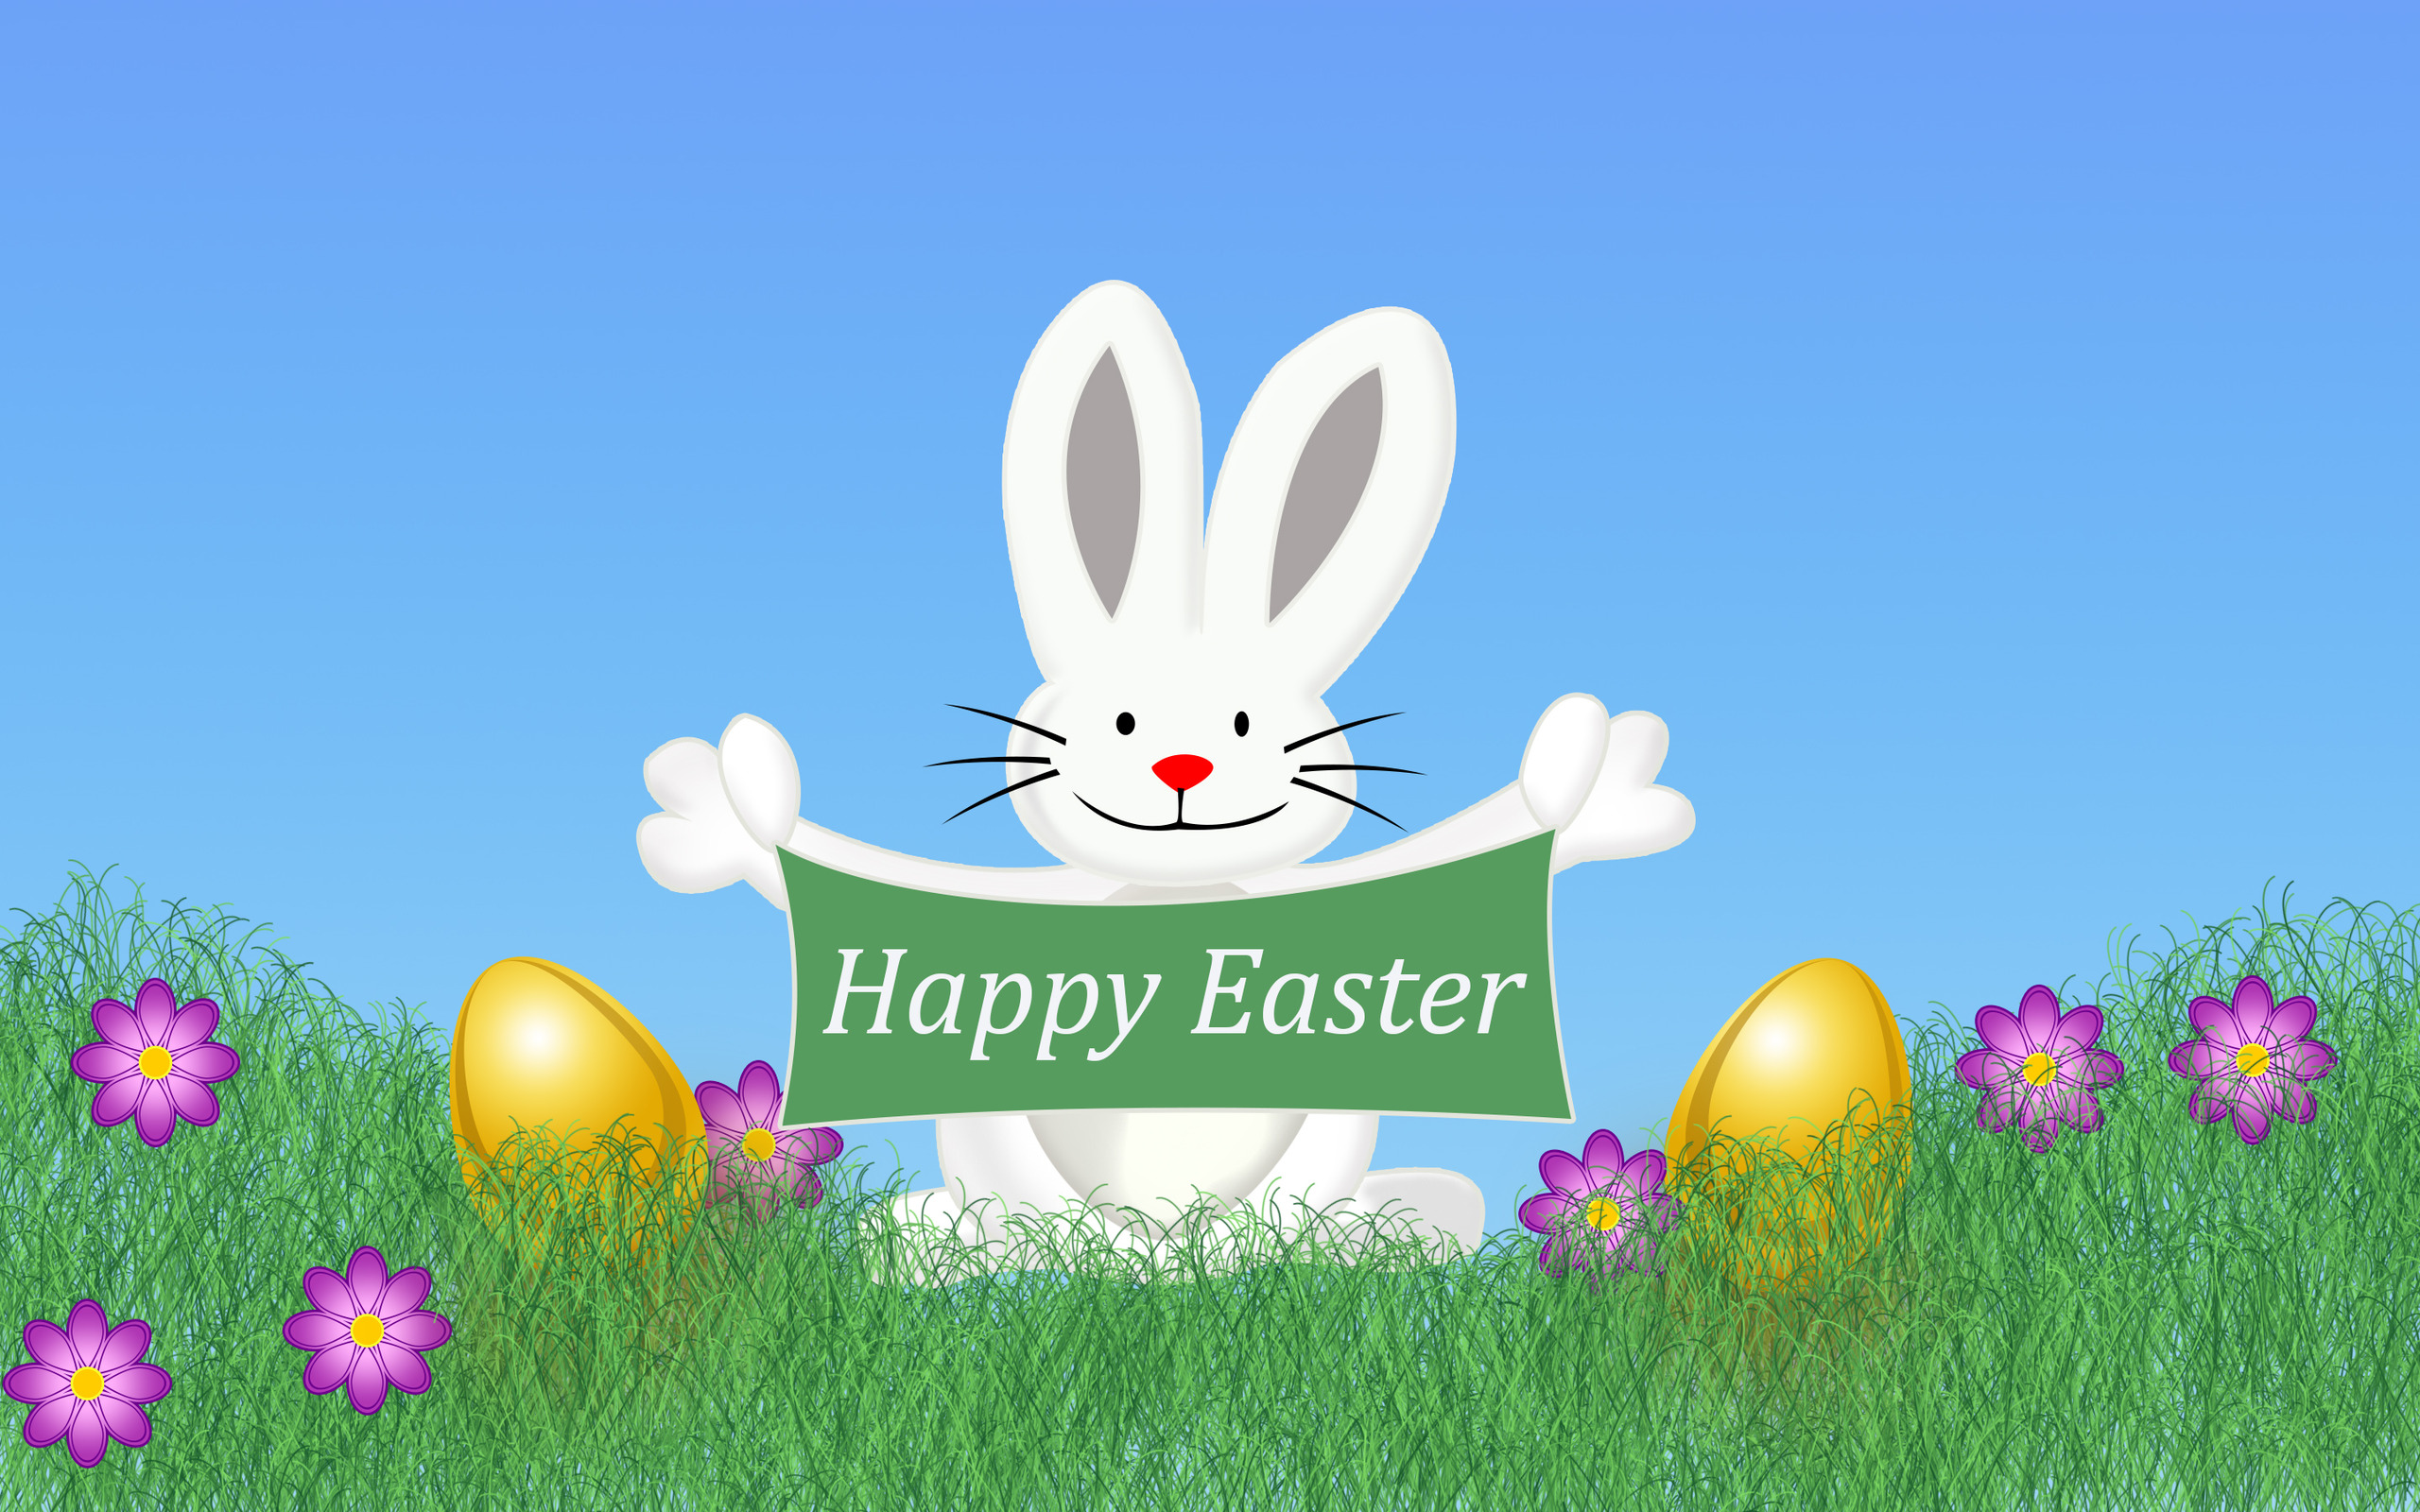 Download Happy Easter wallpaper 2560x1600